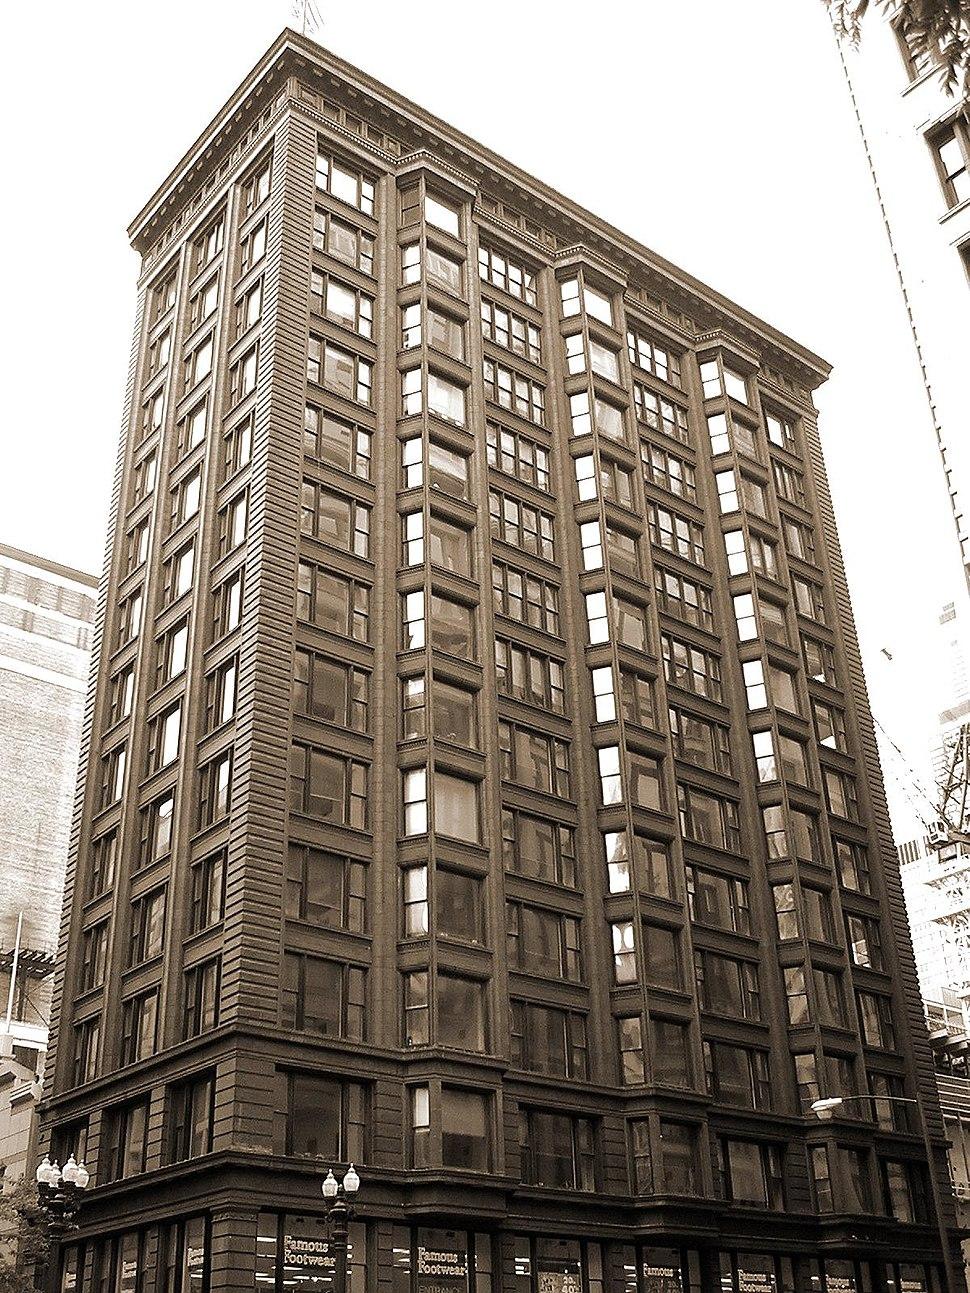 2004-06-09 1200x1600 chicago chicago building